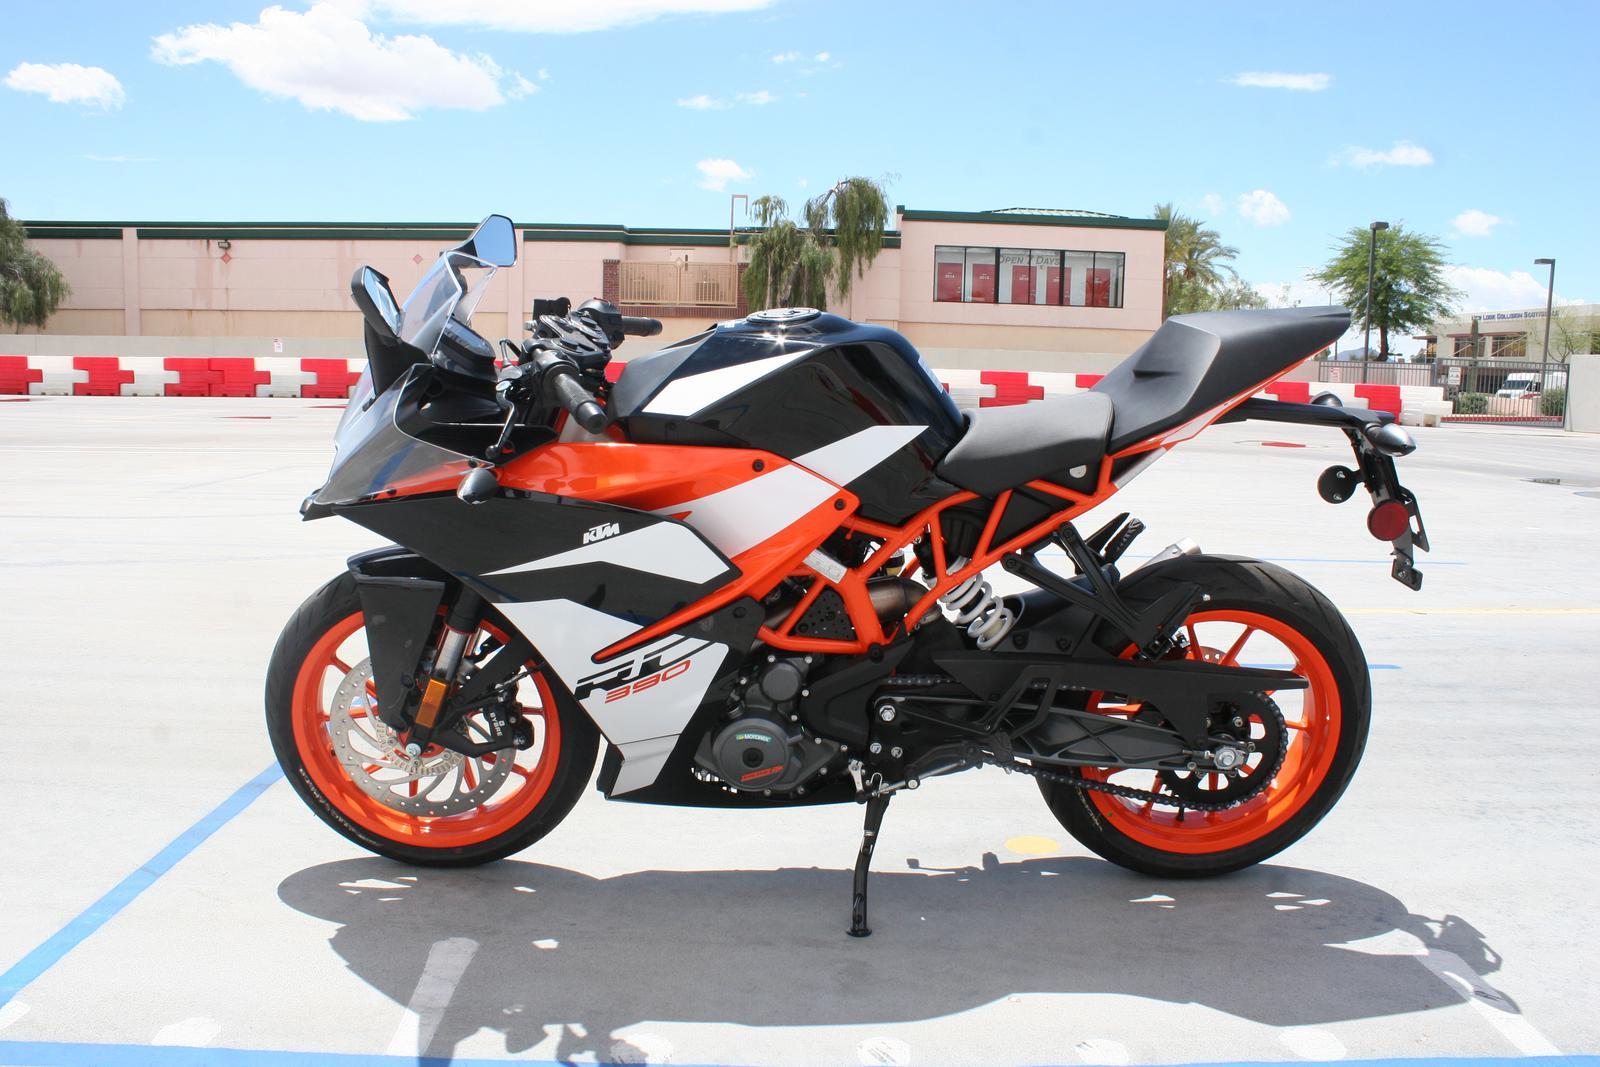 2019 Ktm Rc390 For Sale In Scottsdale Az Go Az Motorcycles In Scottsdale Scottsdale Az 480 775 9378